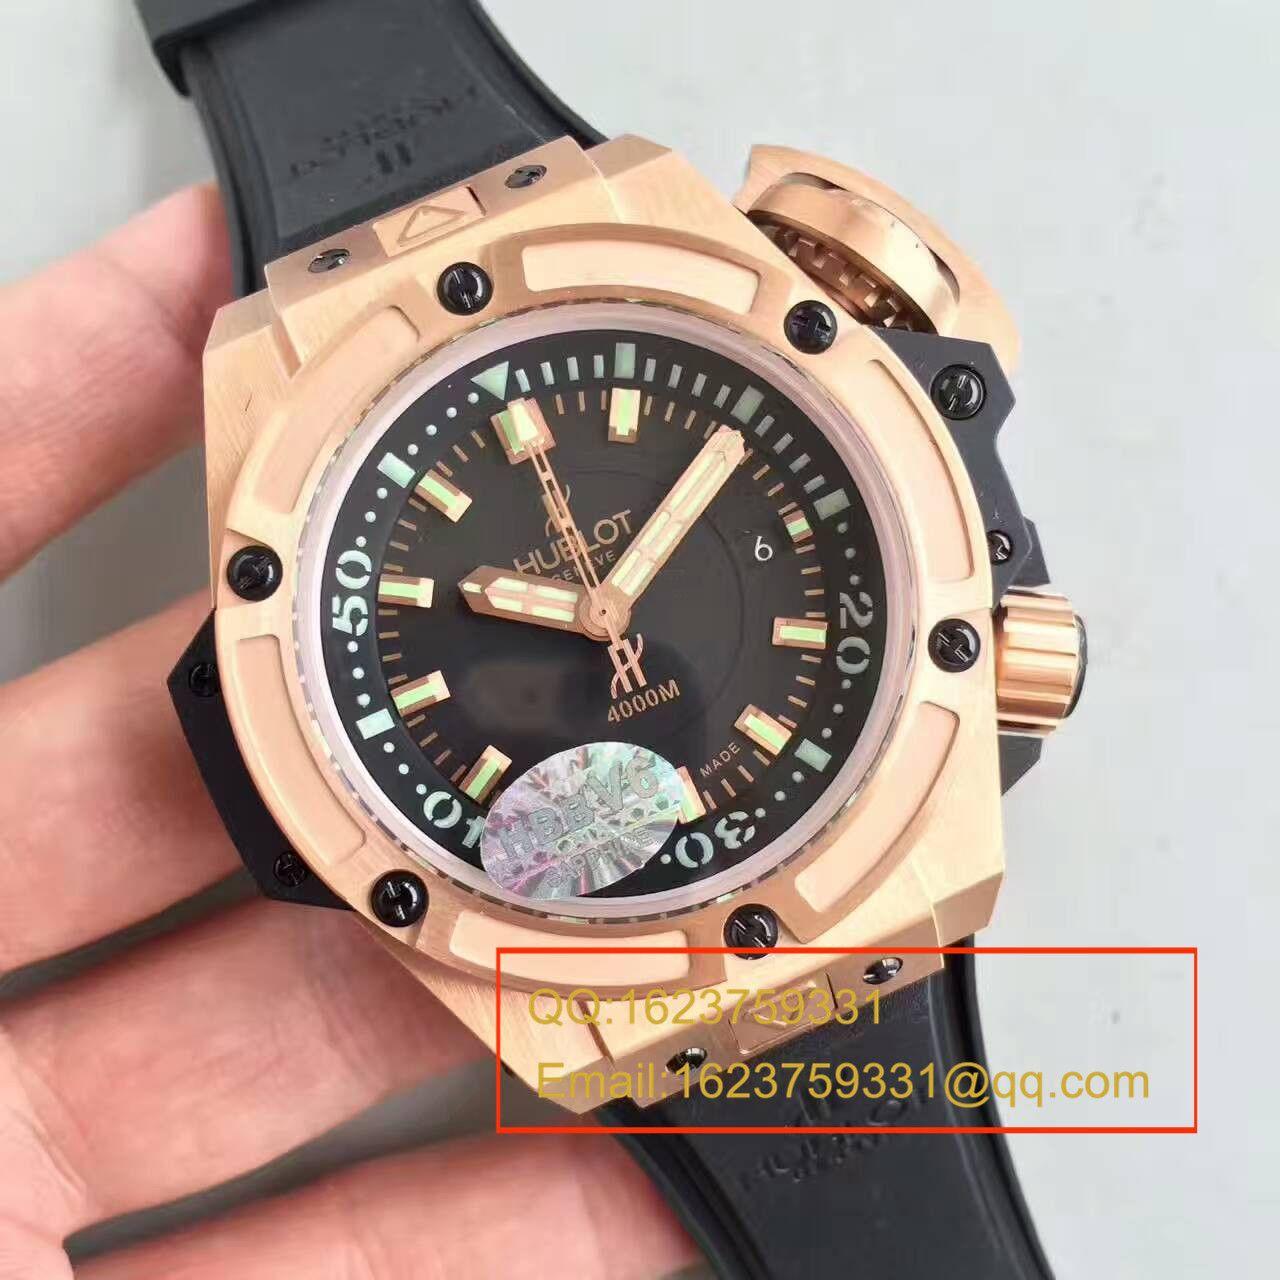 【HBBV6厂1:1顶级复刻手表】宇舶王者至尊系列4000M潜水王超级大怪兽731.OX.1170.RX腕表 / YP001